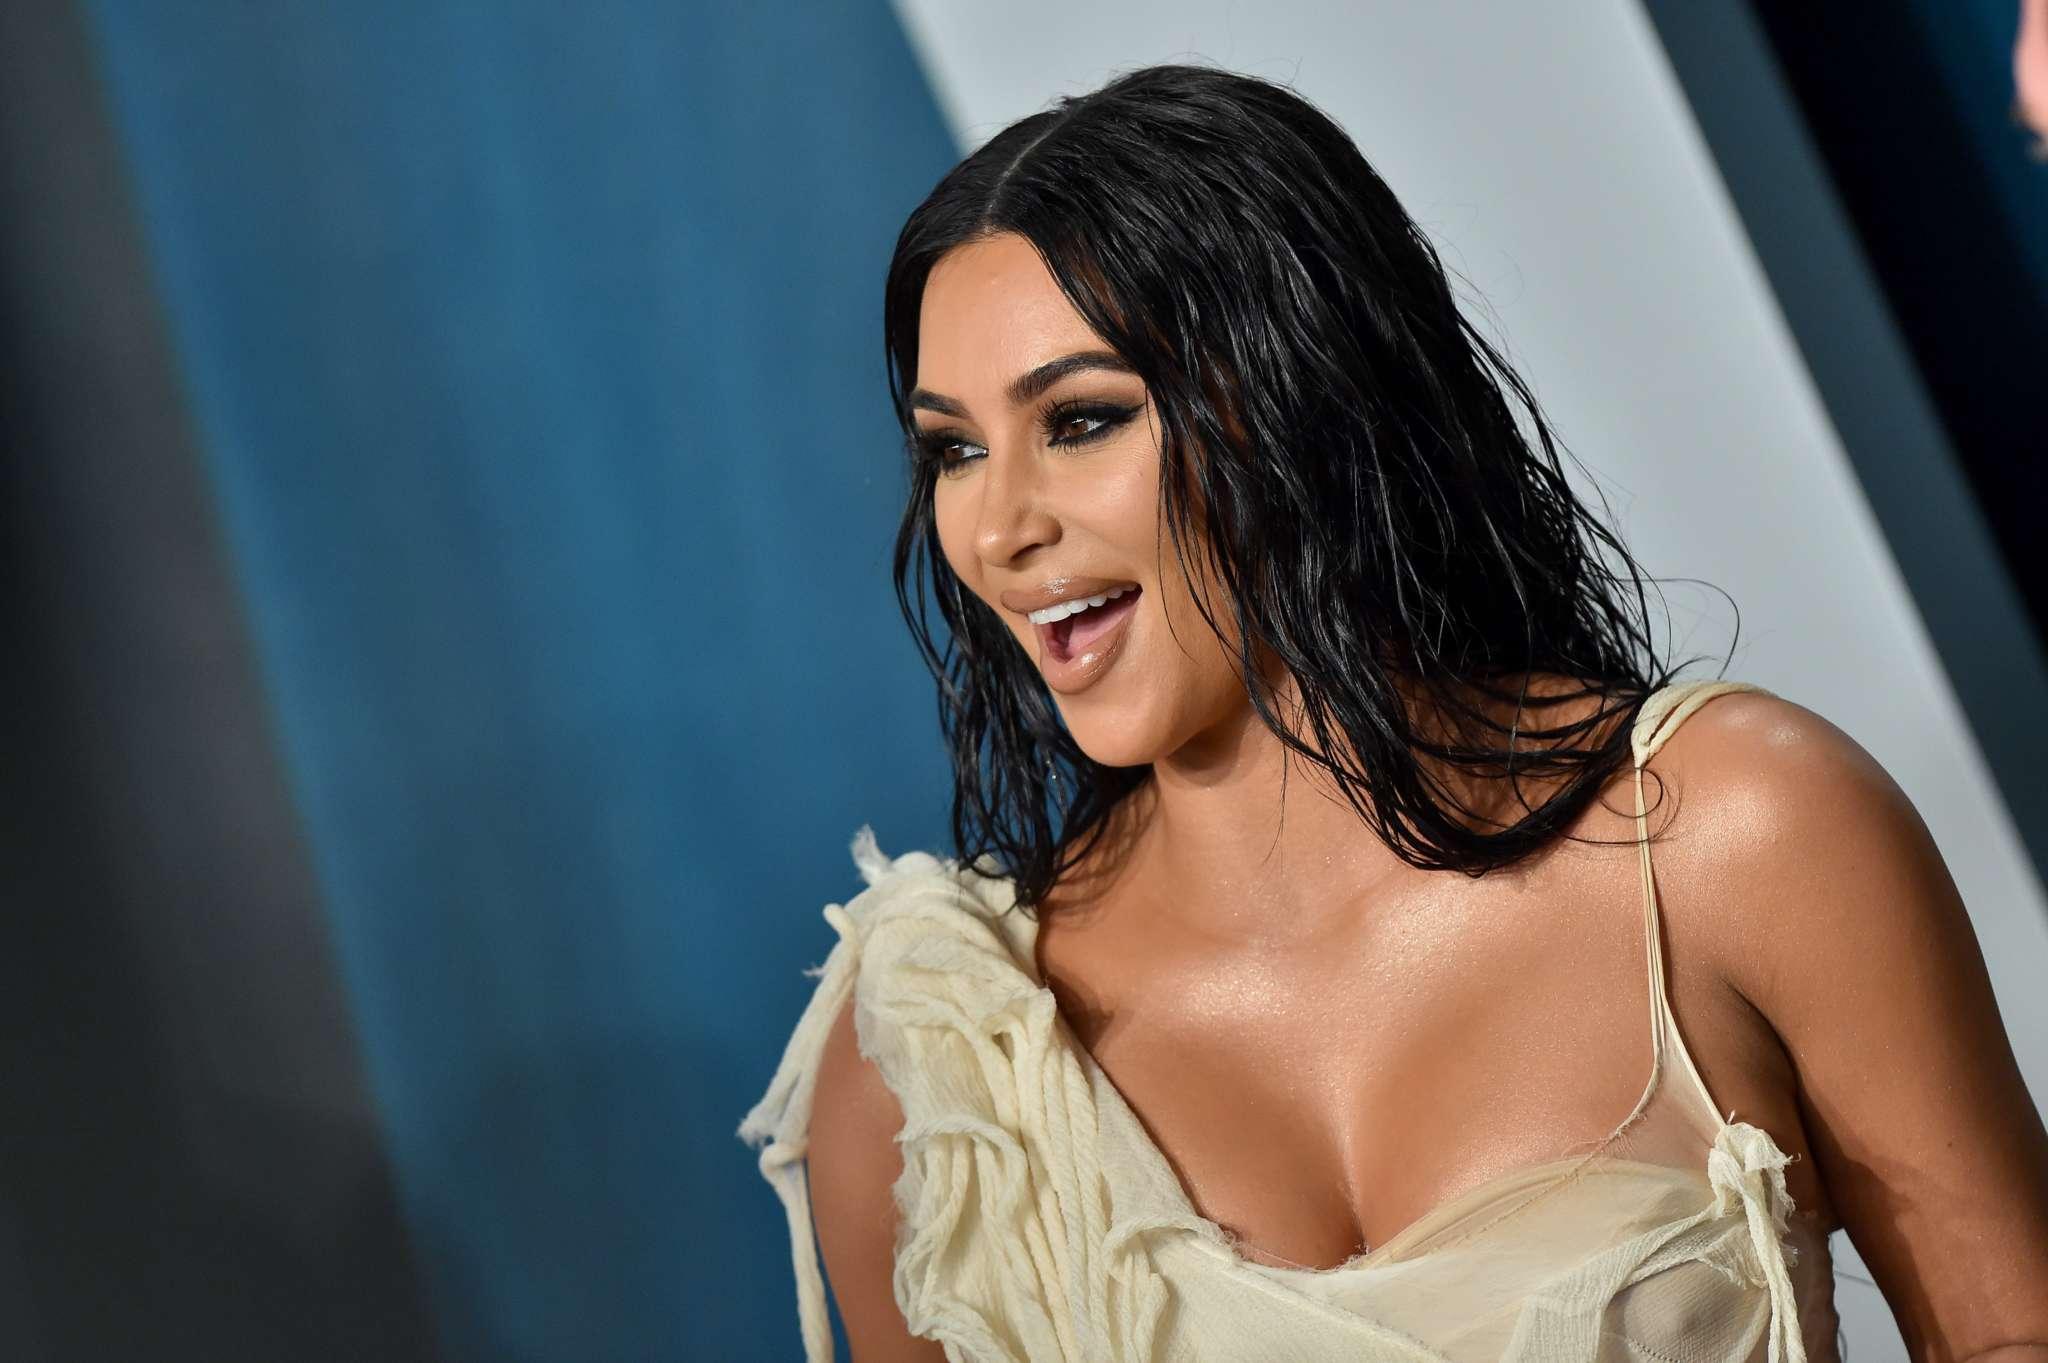 kim-kardashian-has-a-message-for-donald-trump